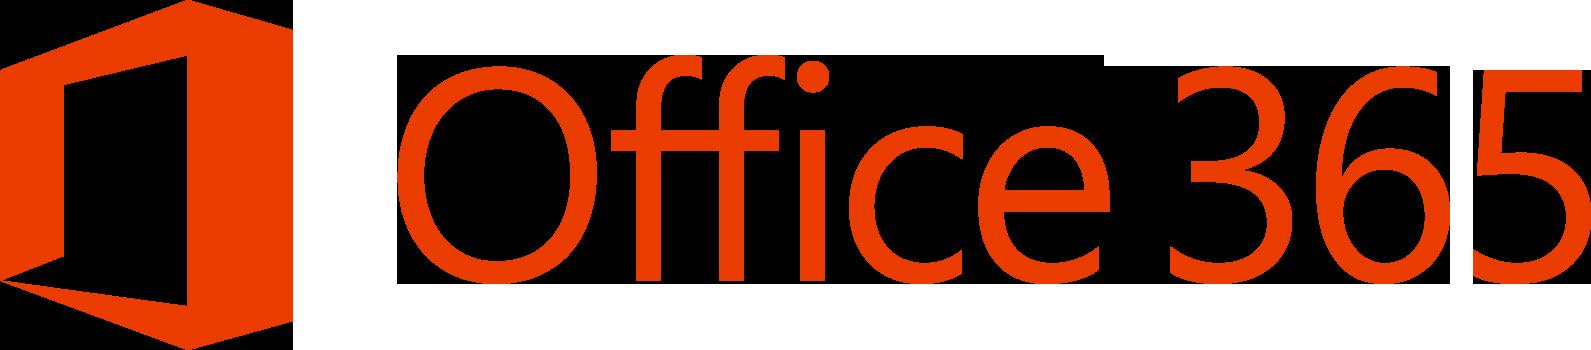 Office365logoOrange